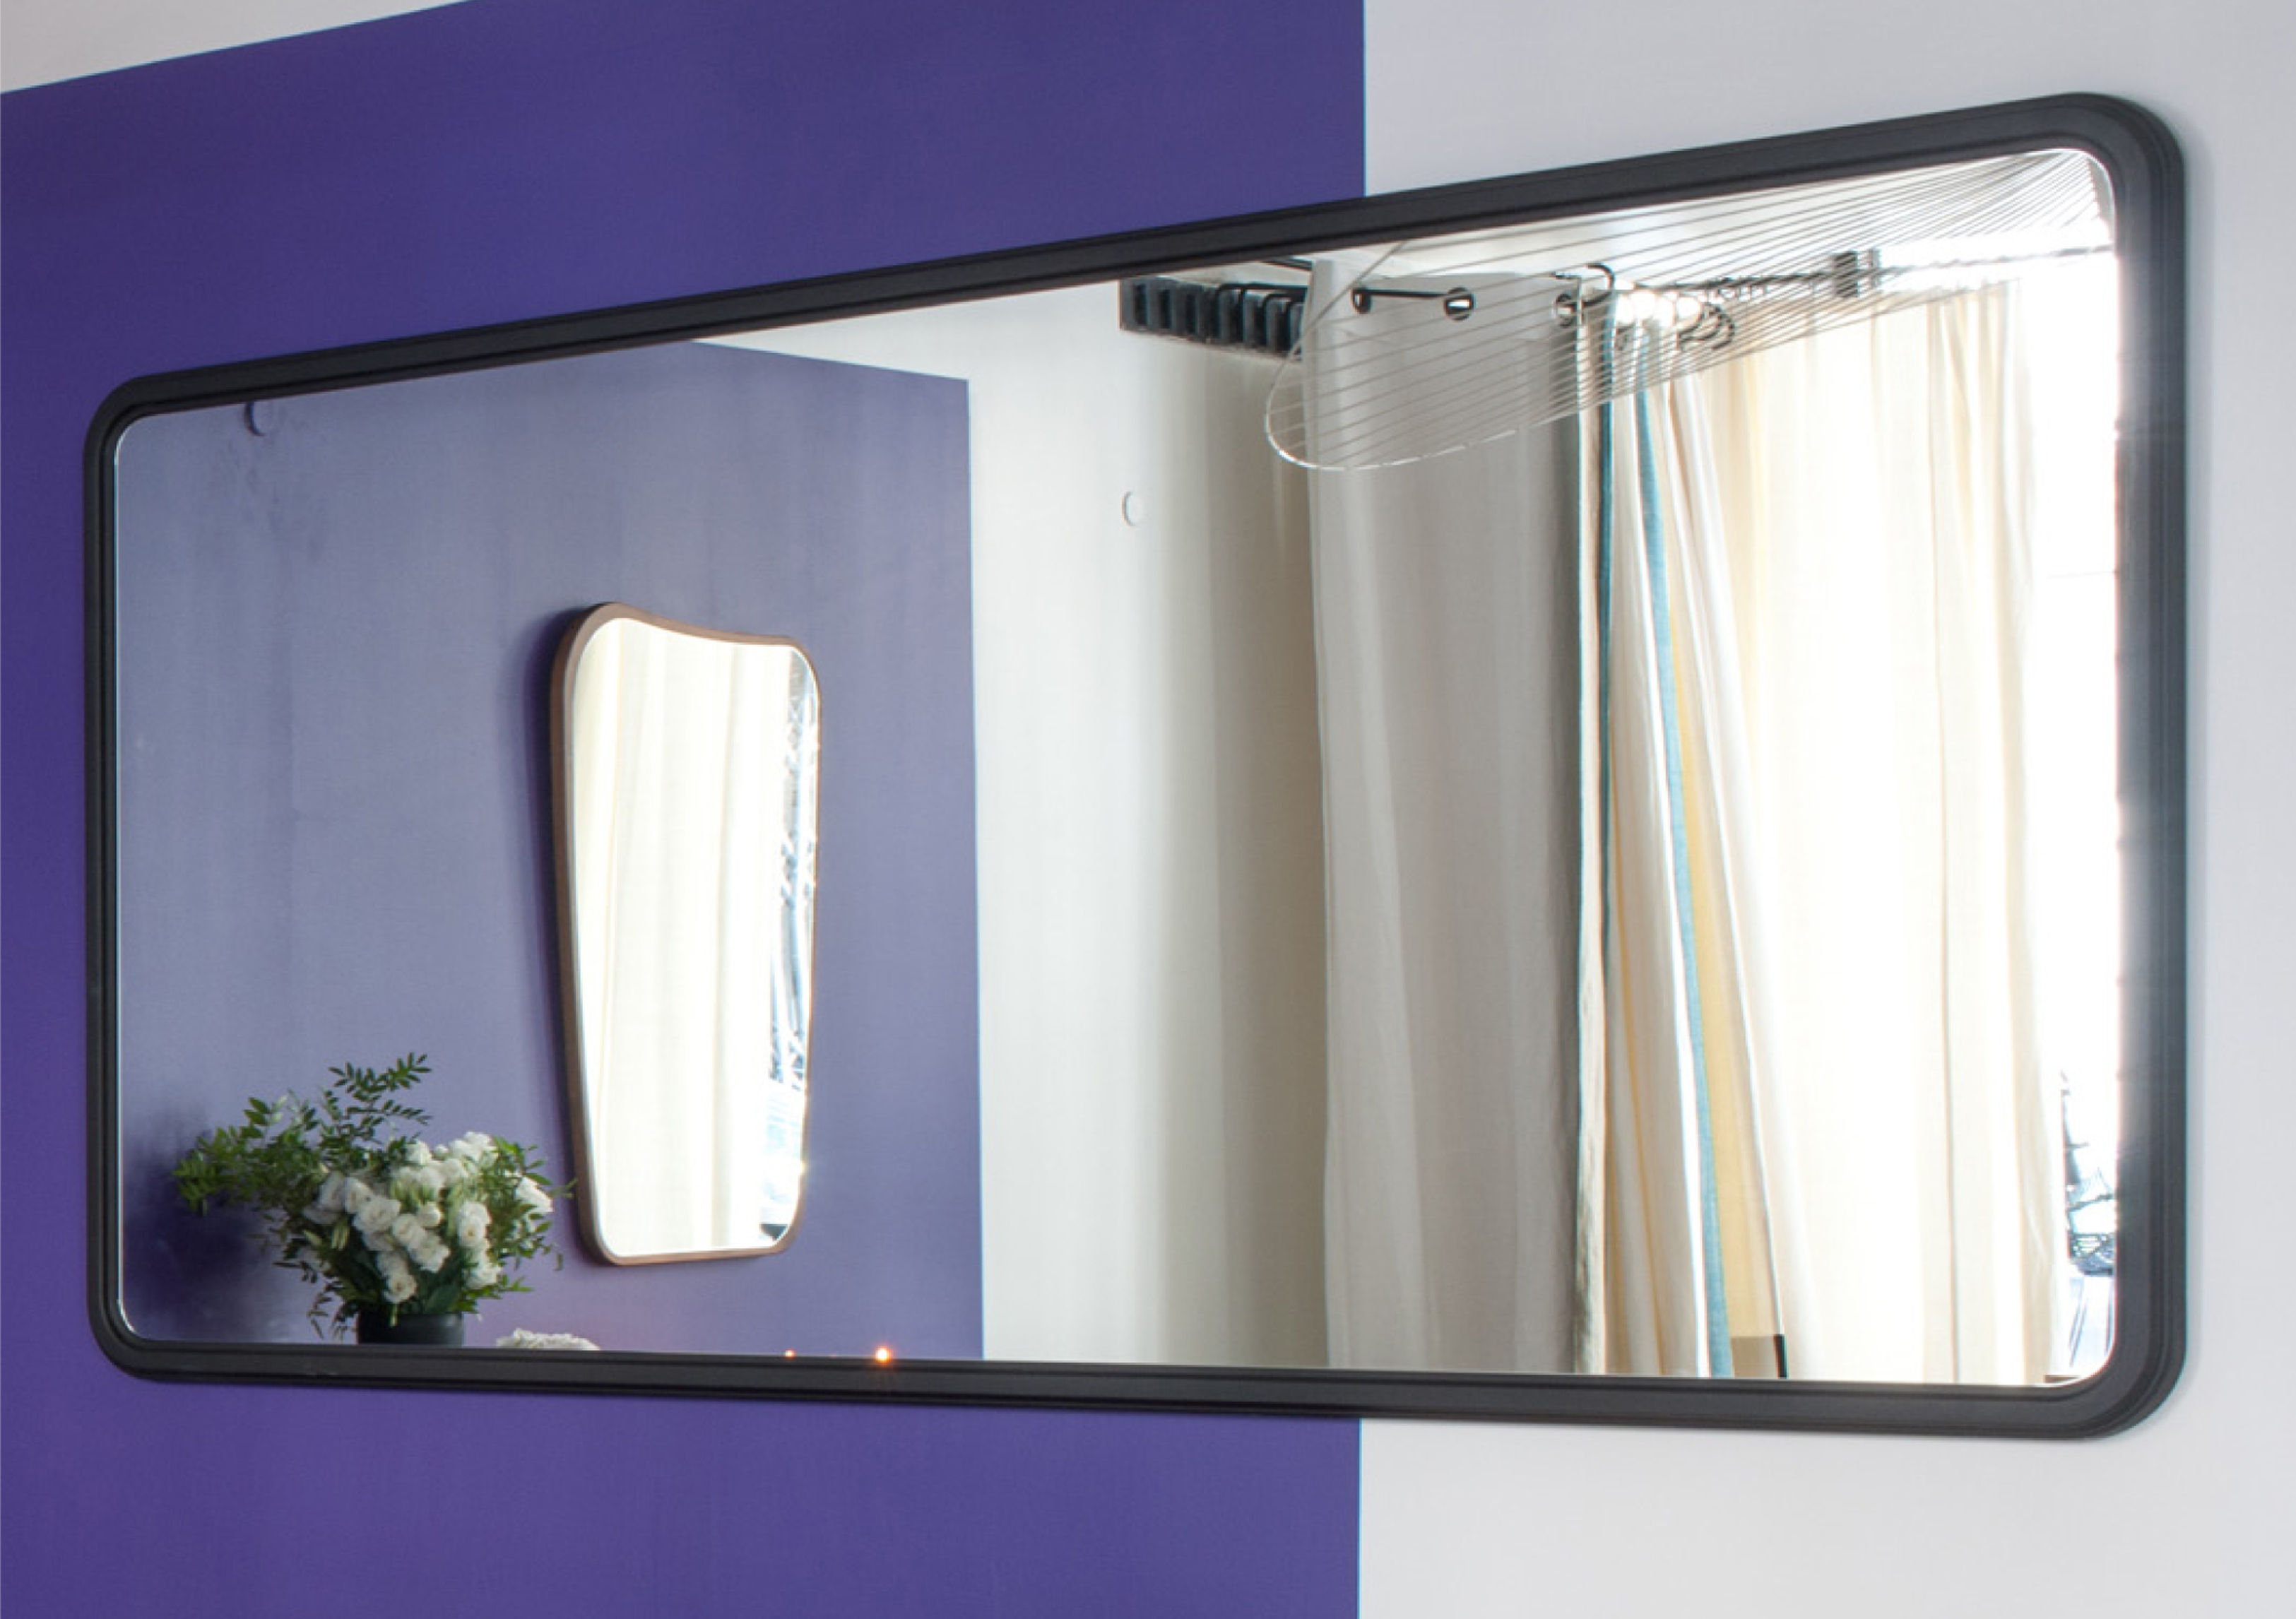 miroir mural haussmann noyer 200 x 100 cm noyer maison sarah lavoine made in design. Black Bedroom Furniture Sets. Home Design Ideas